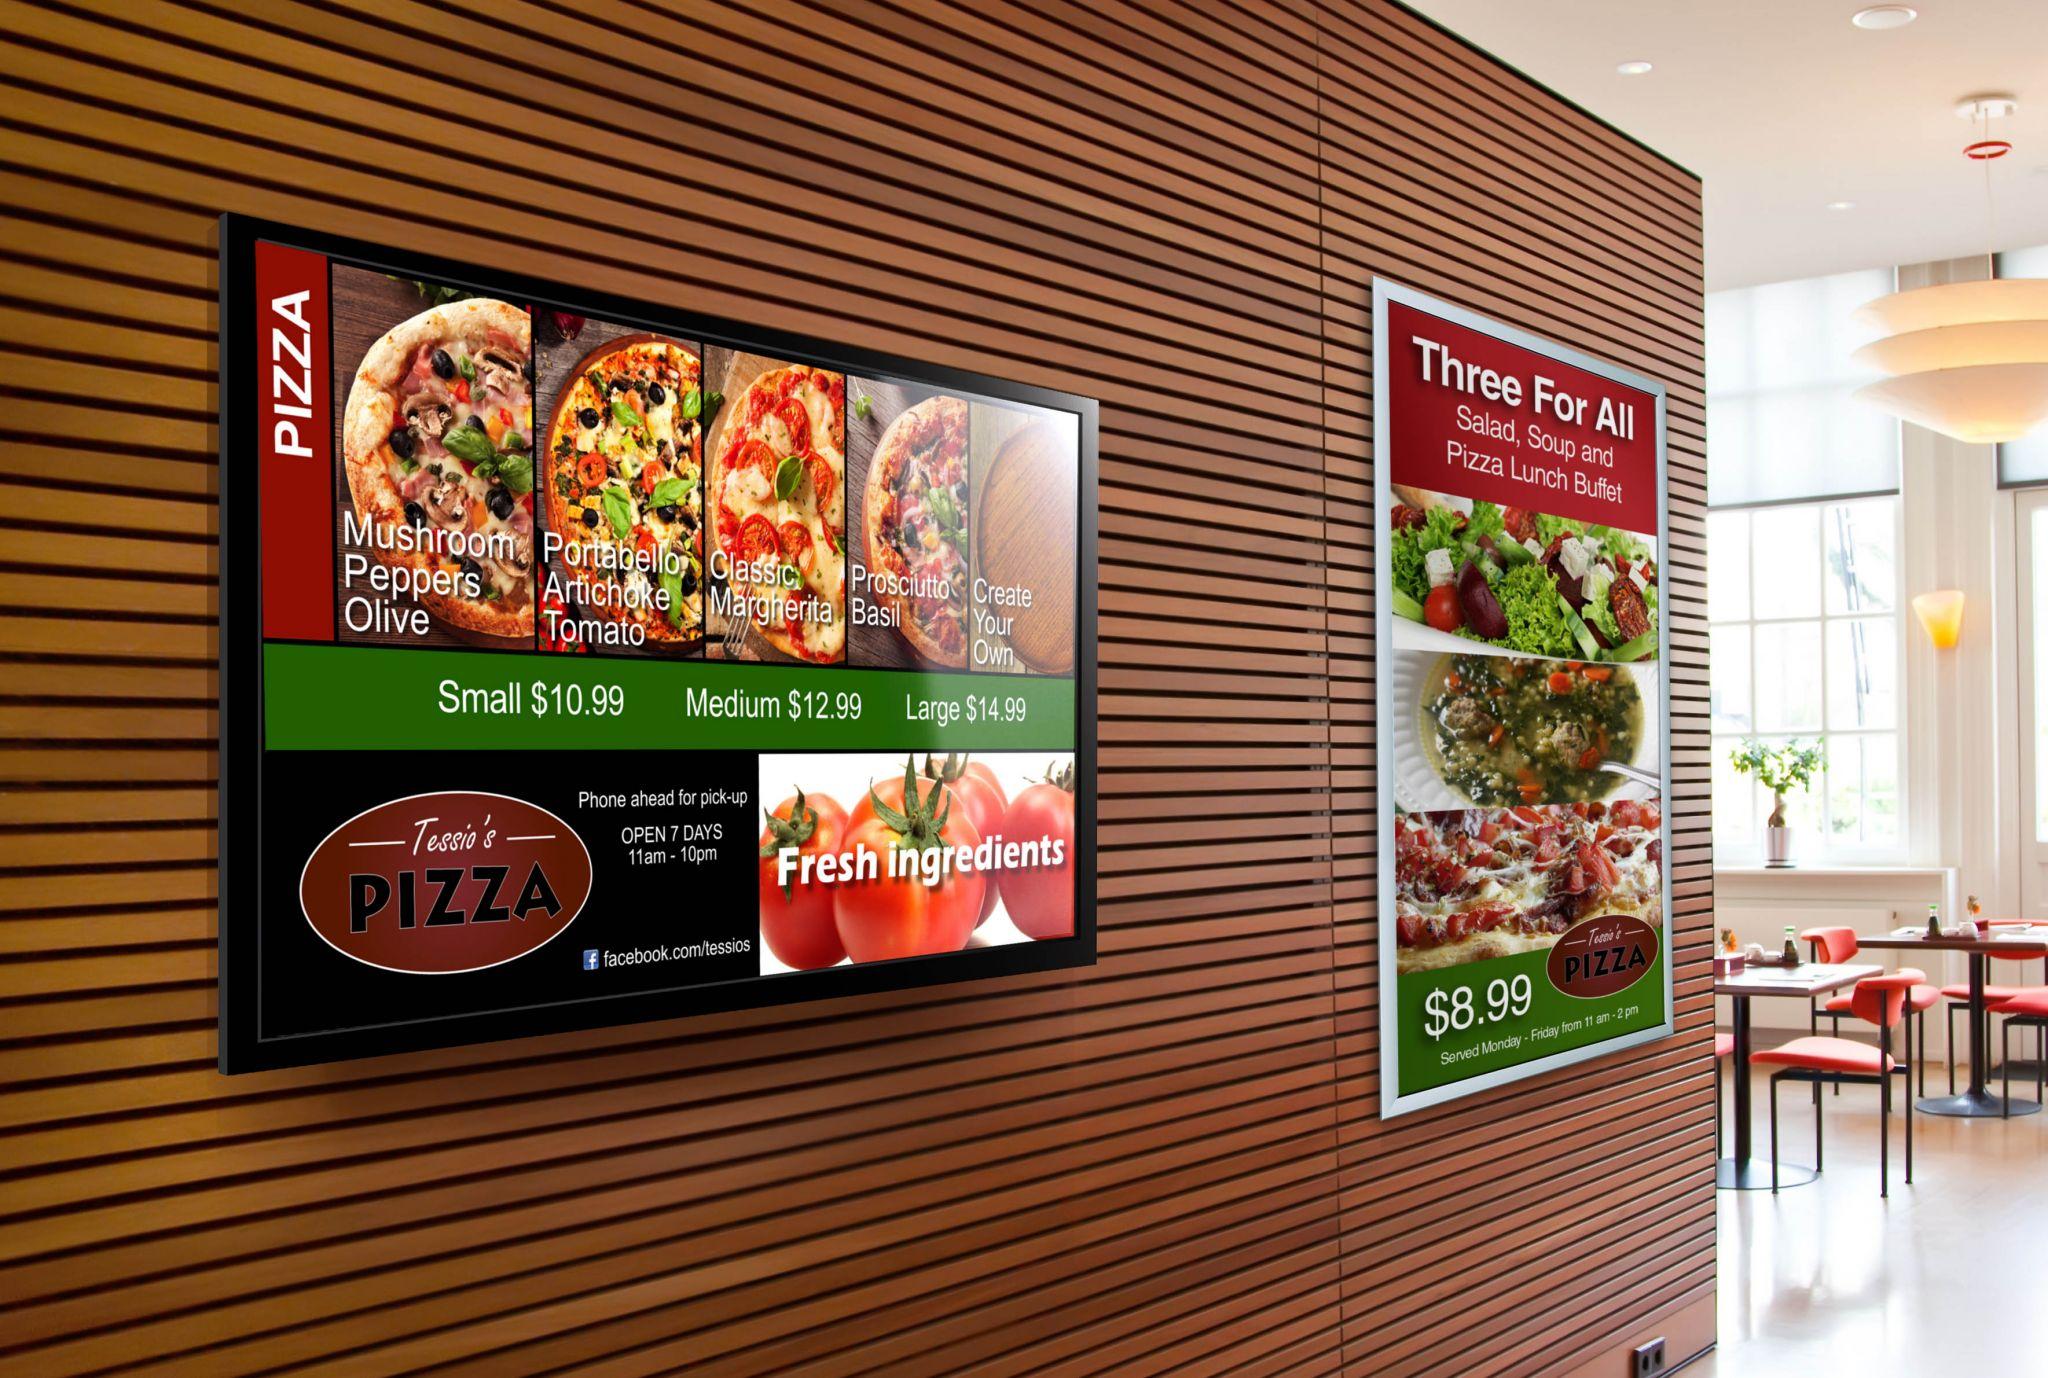 Restaurant Menu Board Signs